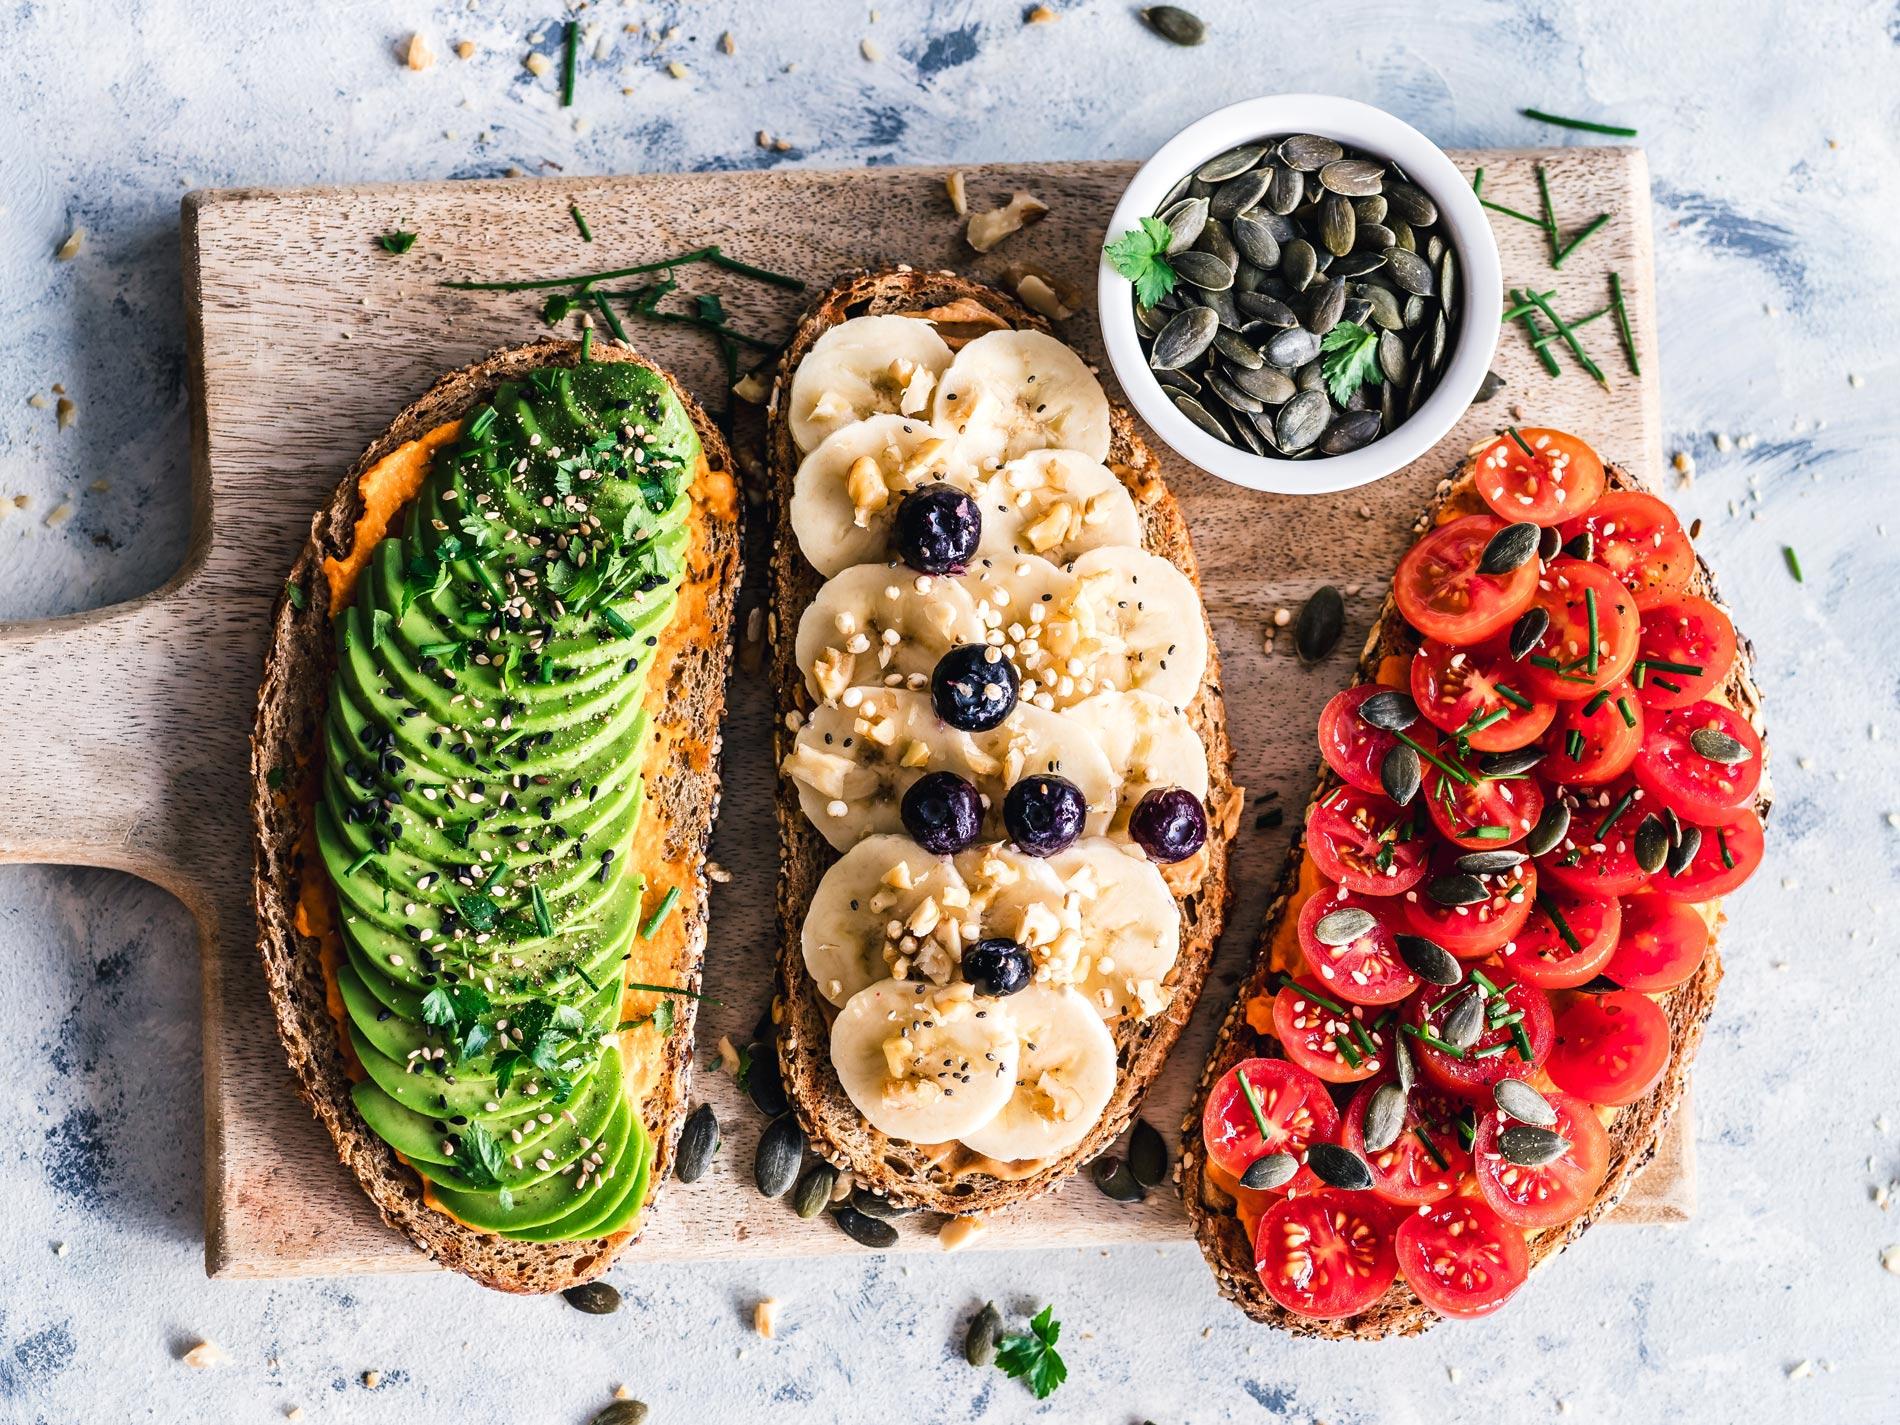 Los 5 mejores restaurantes veganos de Madrid